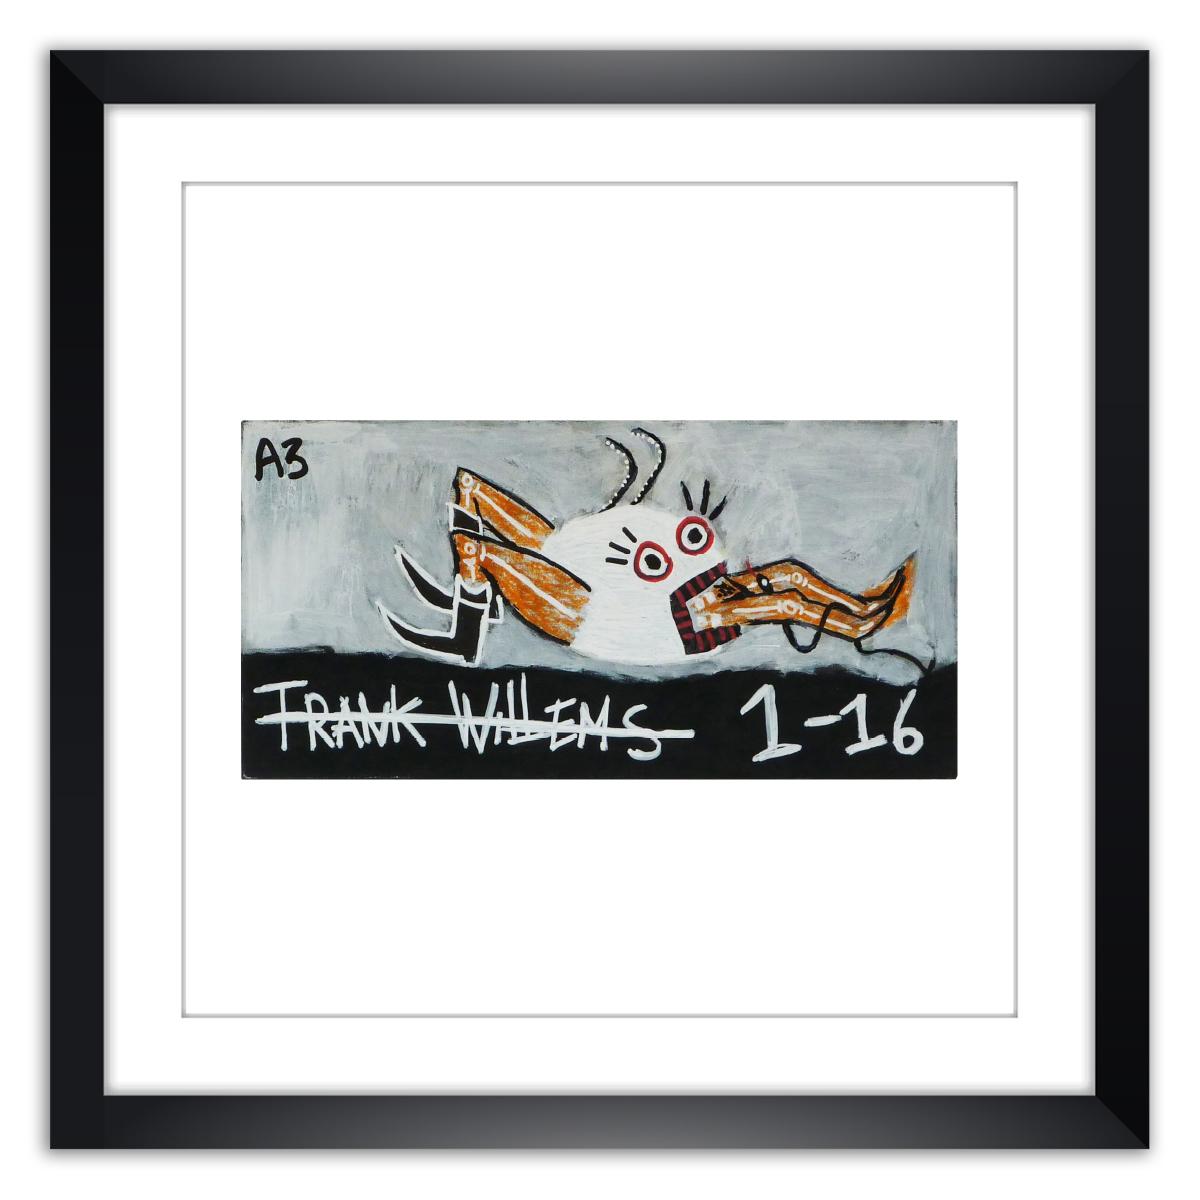 Limited prints - JÉBÉ A3 framed - Frank Willems